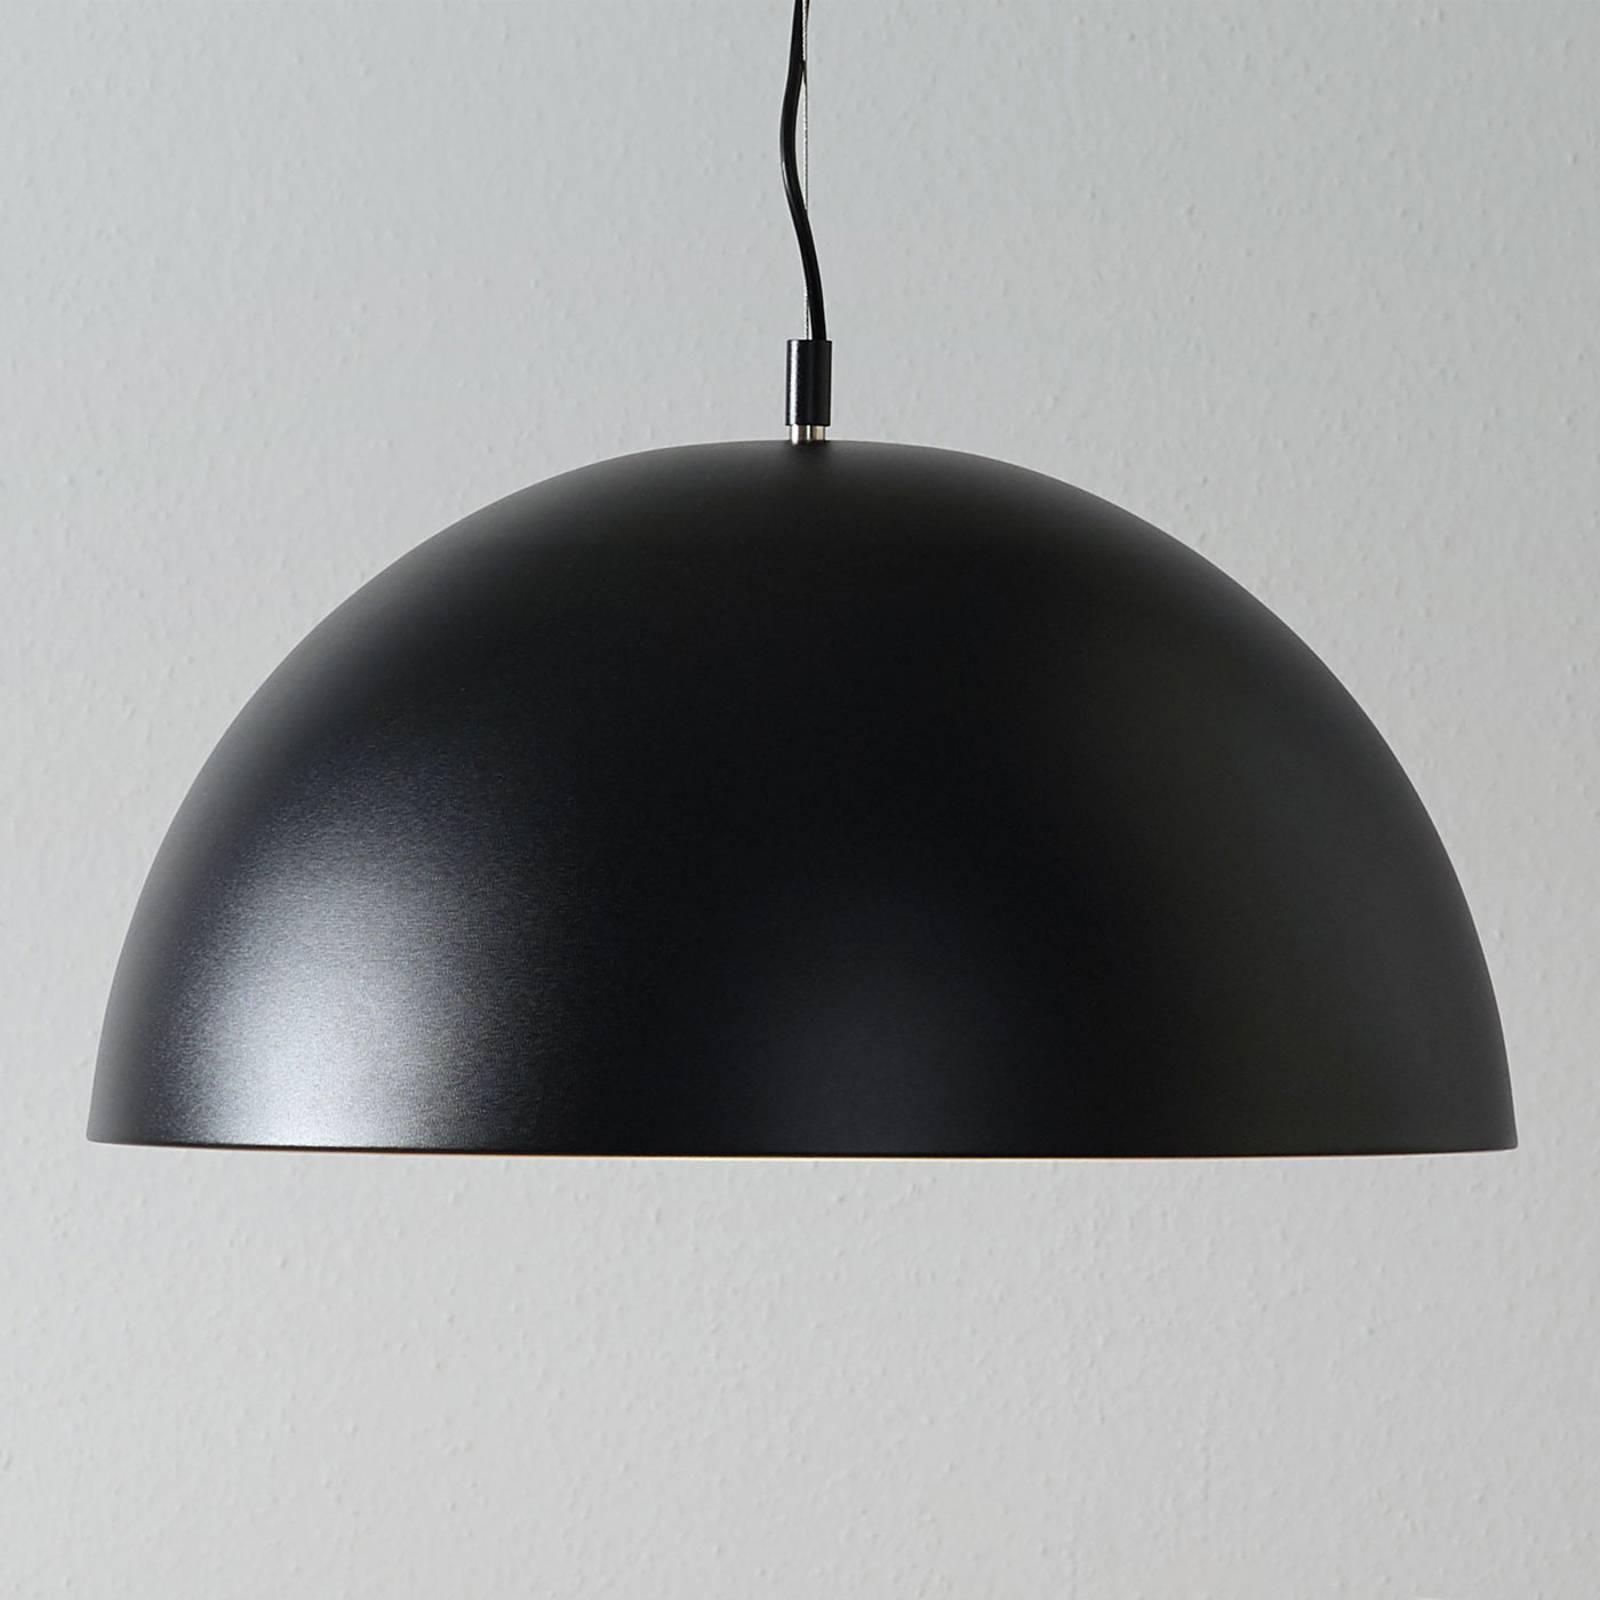 Lucande Phelan lampa wisząca 50cm czarna/złota